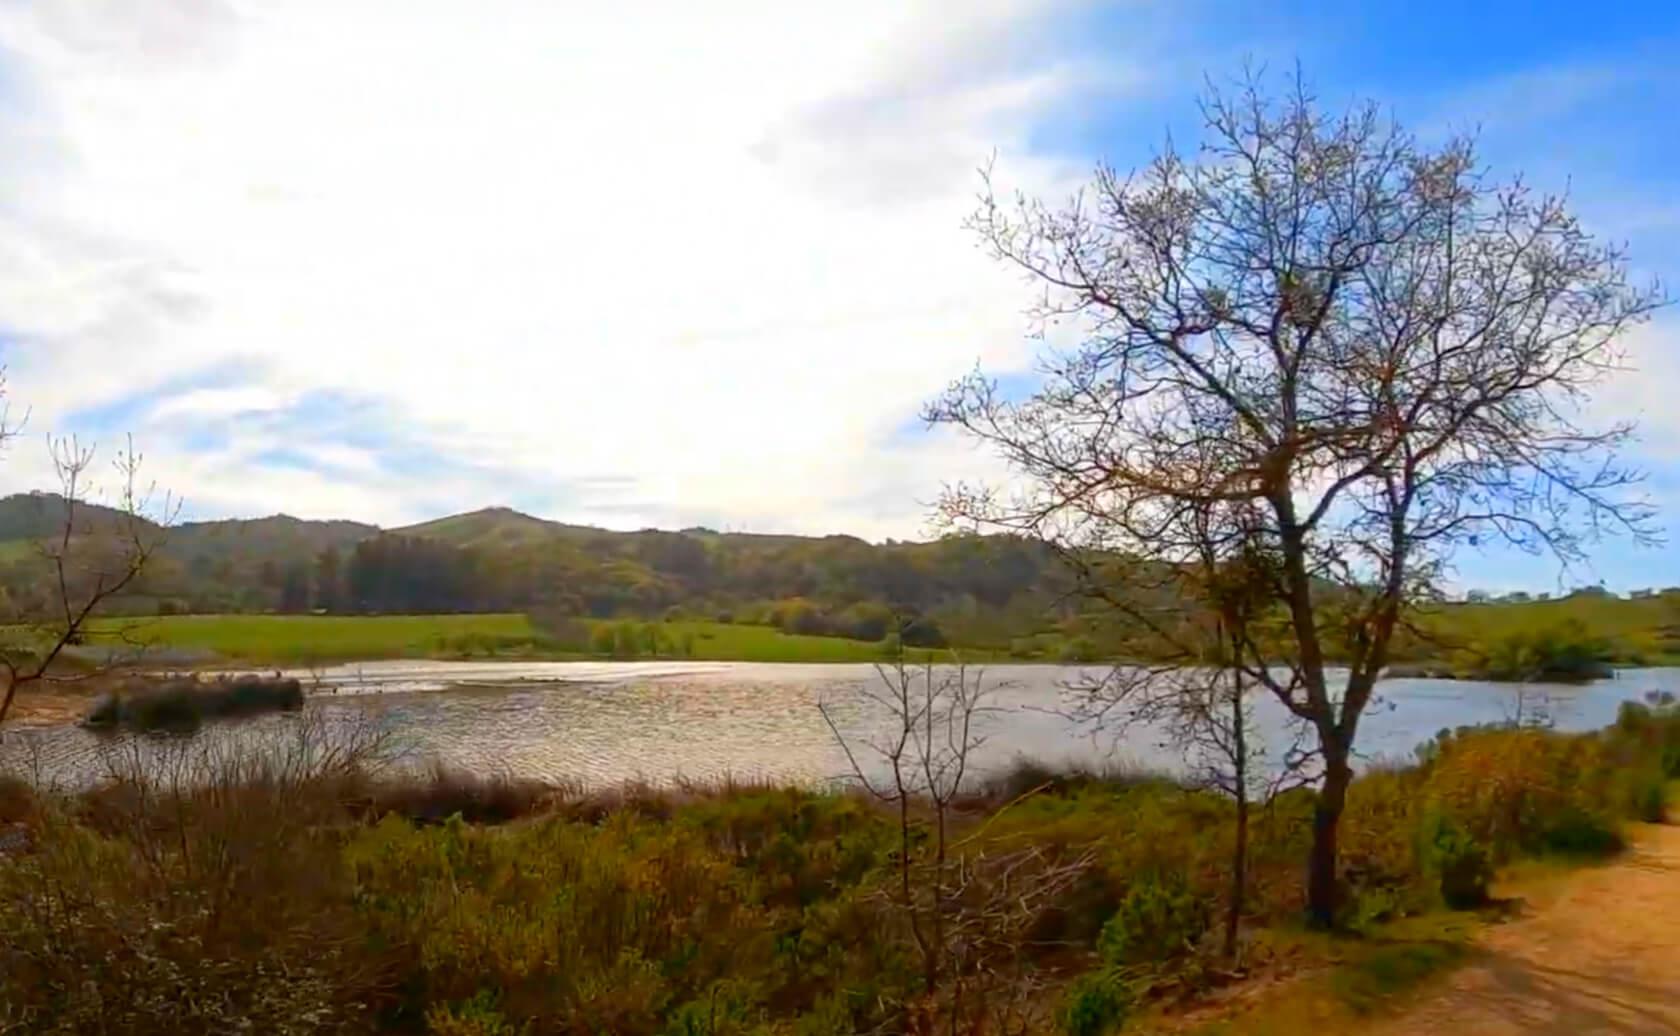 Grant-Lake-Fishing-Guide-Report-Hamilton-CA-03